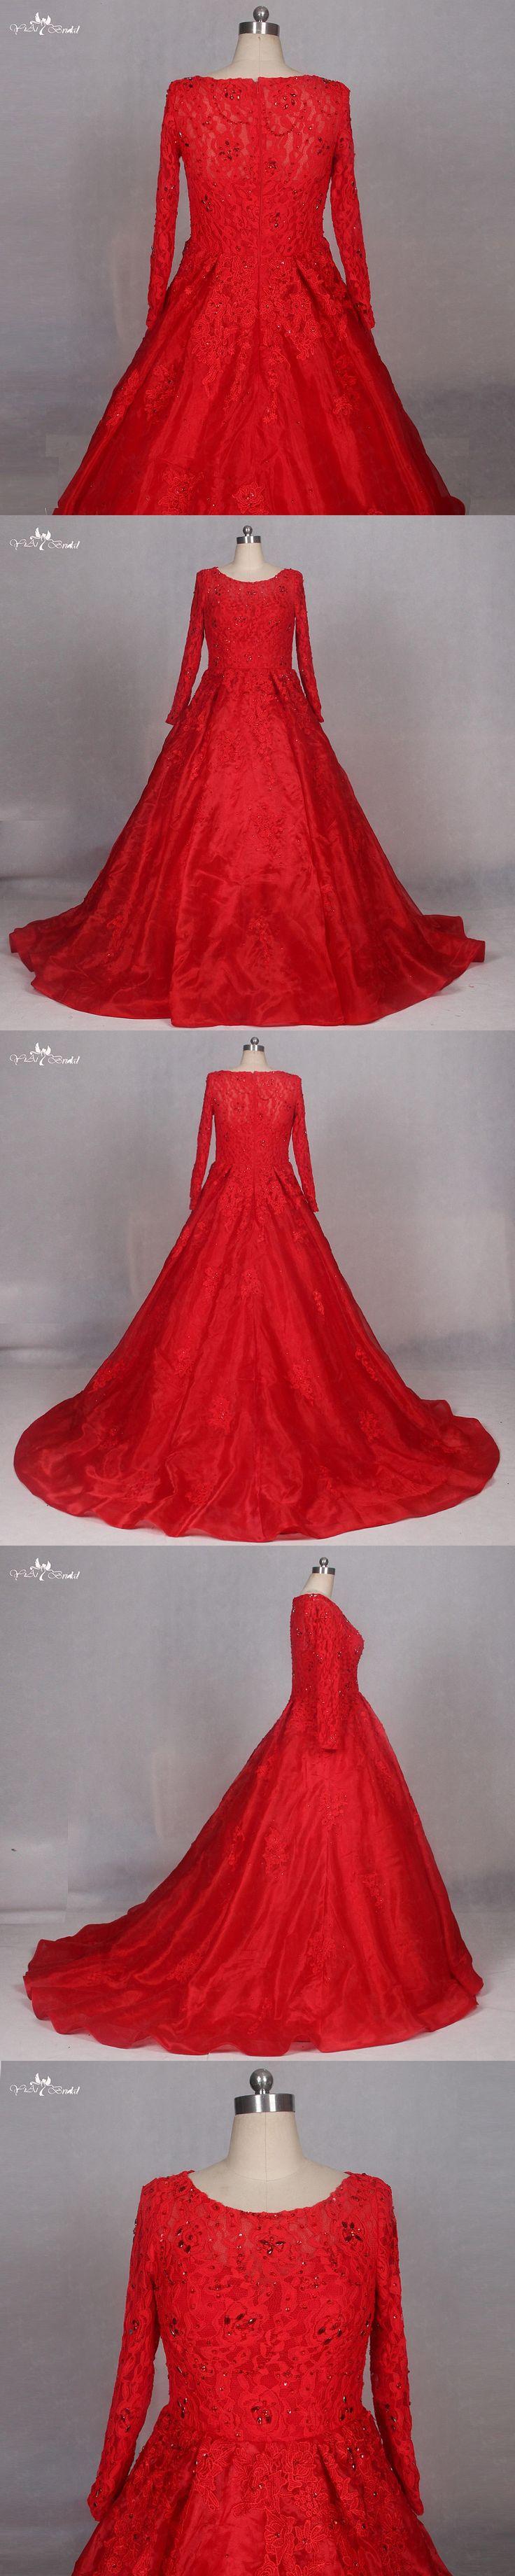 LZ184 Red Wedding Dress Long Sleeve Muslim Wedding Dress Ball Gown Crystal Wedding Dresses